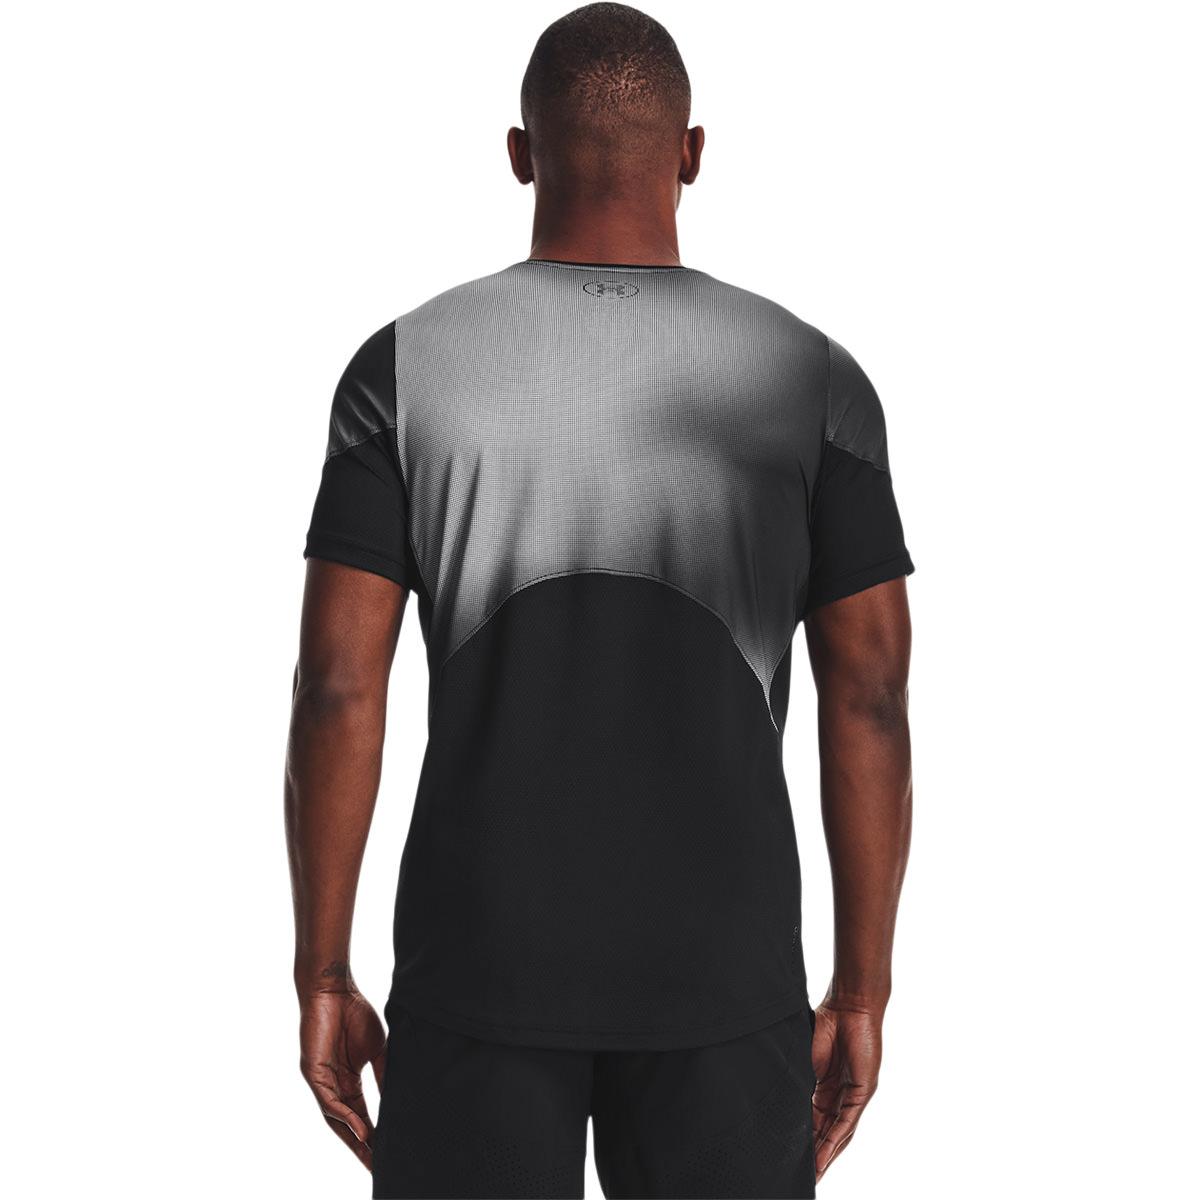 Under Armour Rush Heat Gear 2.0 Trænings T-shirt Herre